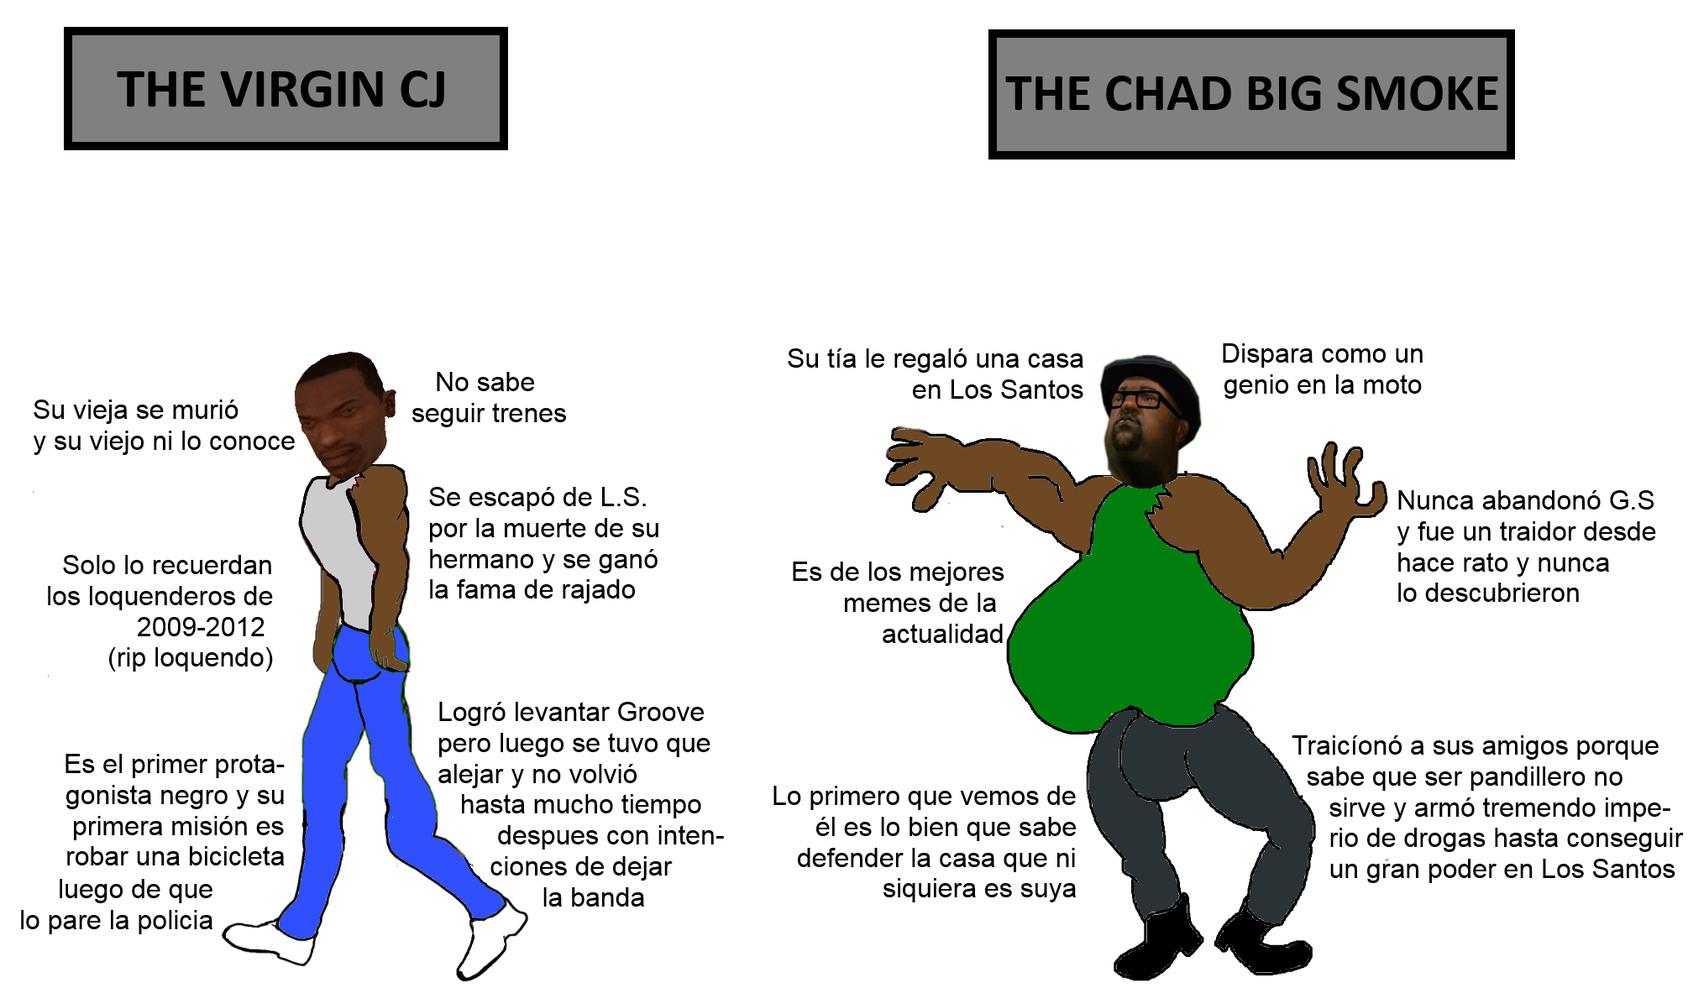 The Virgin CJ vs. The Chad Big Smoke - meme